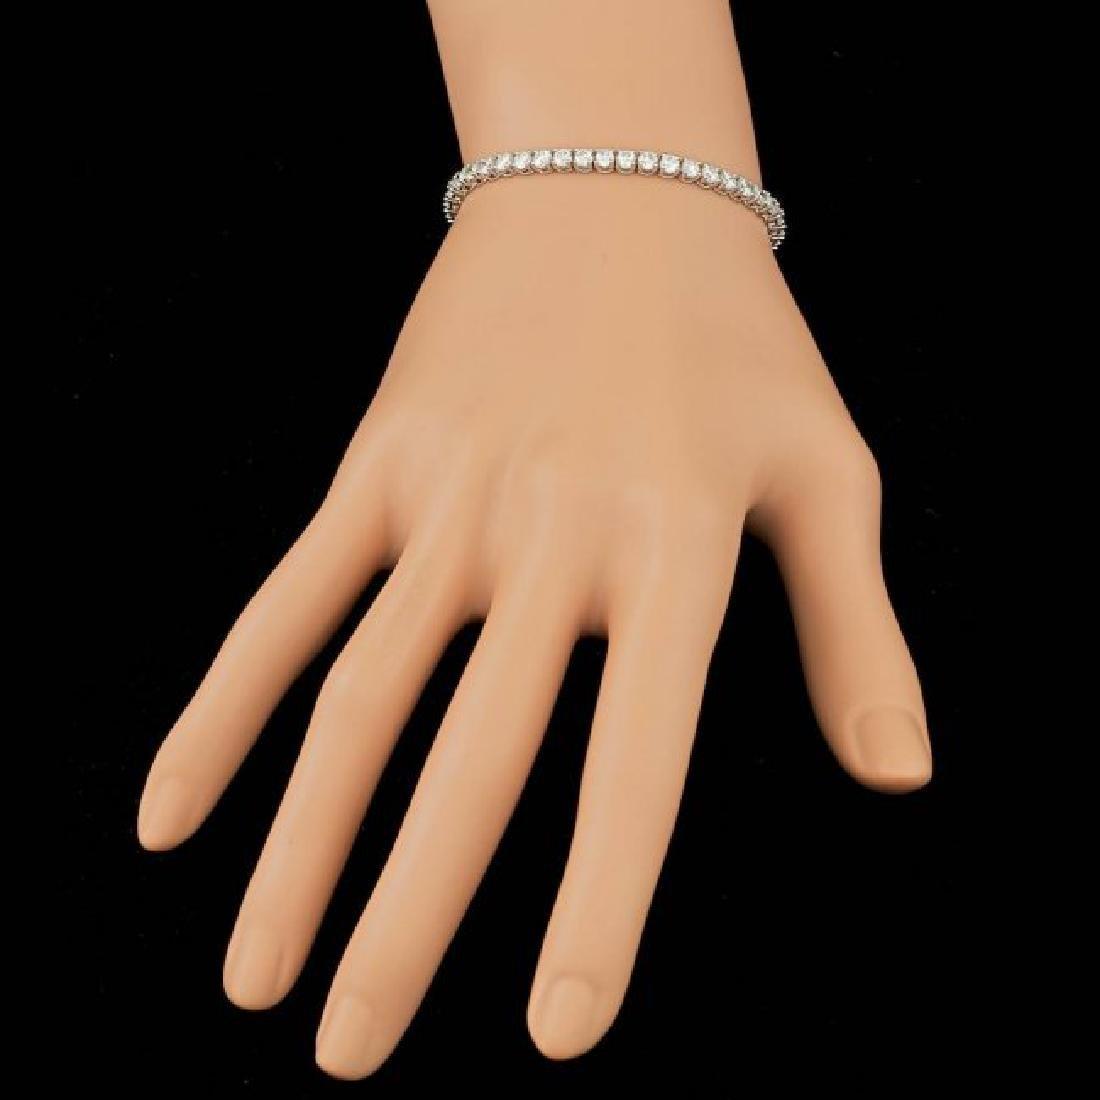 18k White Gold 6.55ct Diamond Bracelet - 5